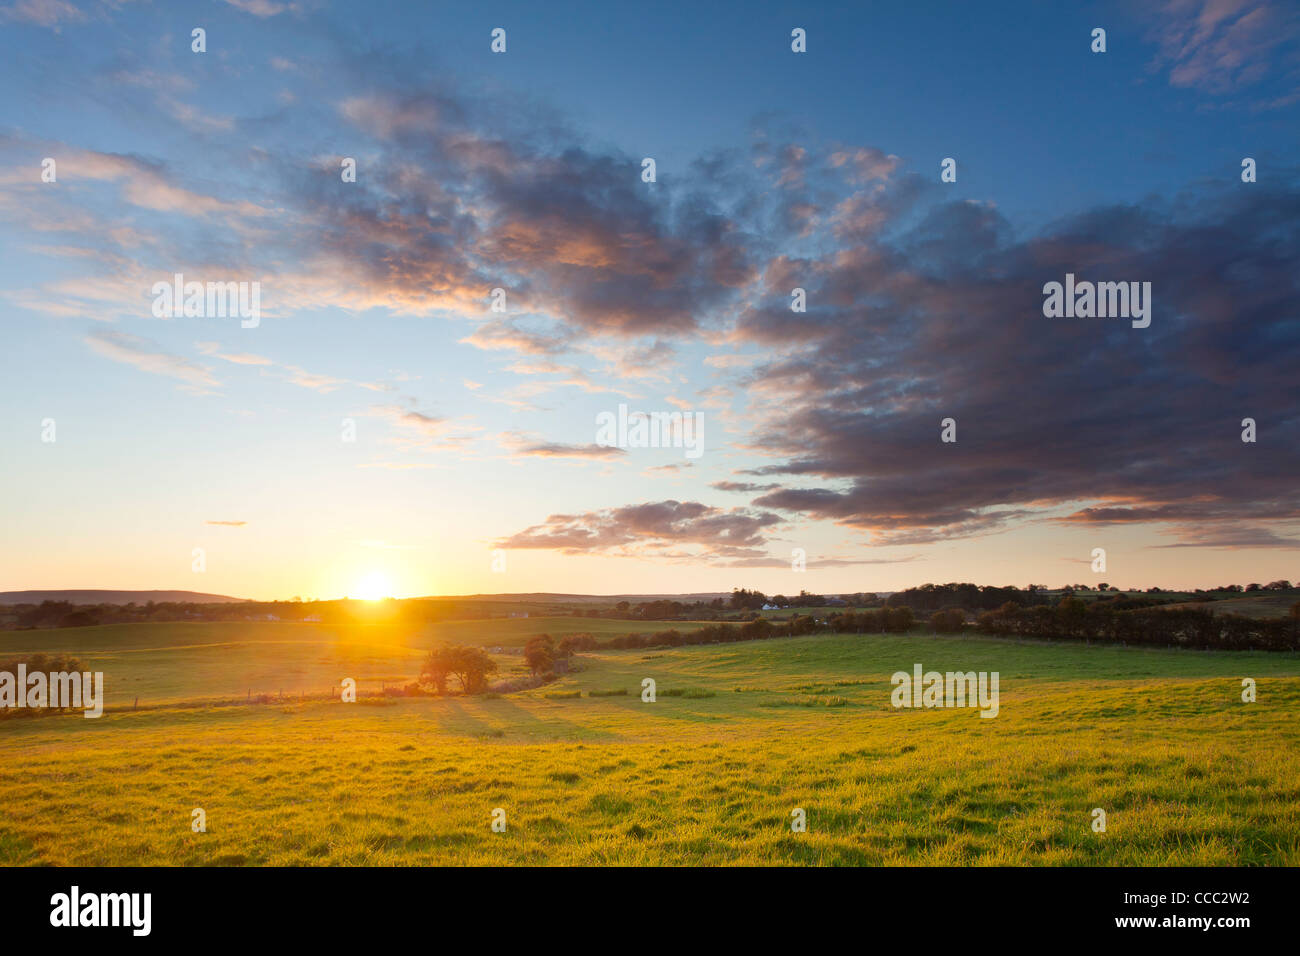 Wiese Sonnenuntergang, County Mayo, Irland. Stockbild